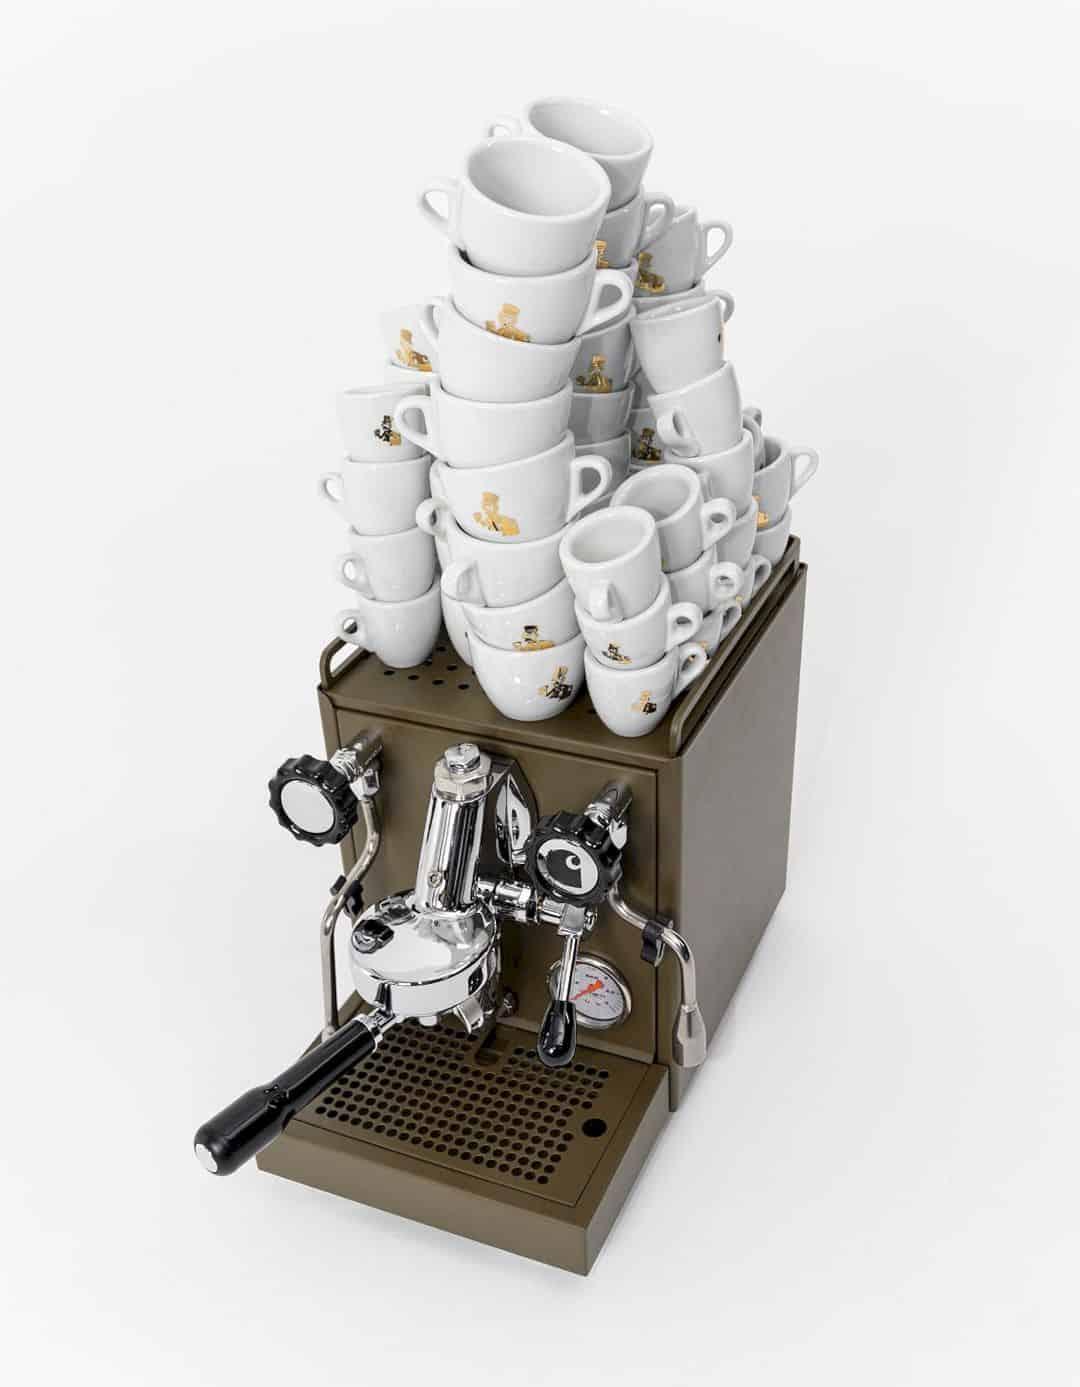 Carhartt WIP X Rocket Espresso Milano 3